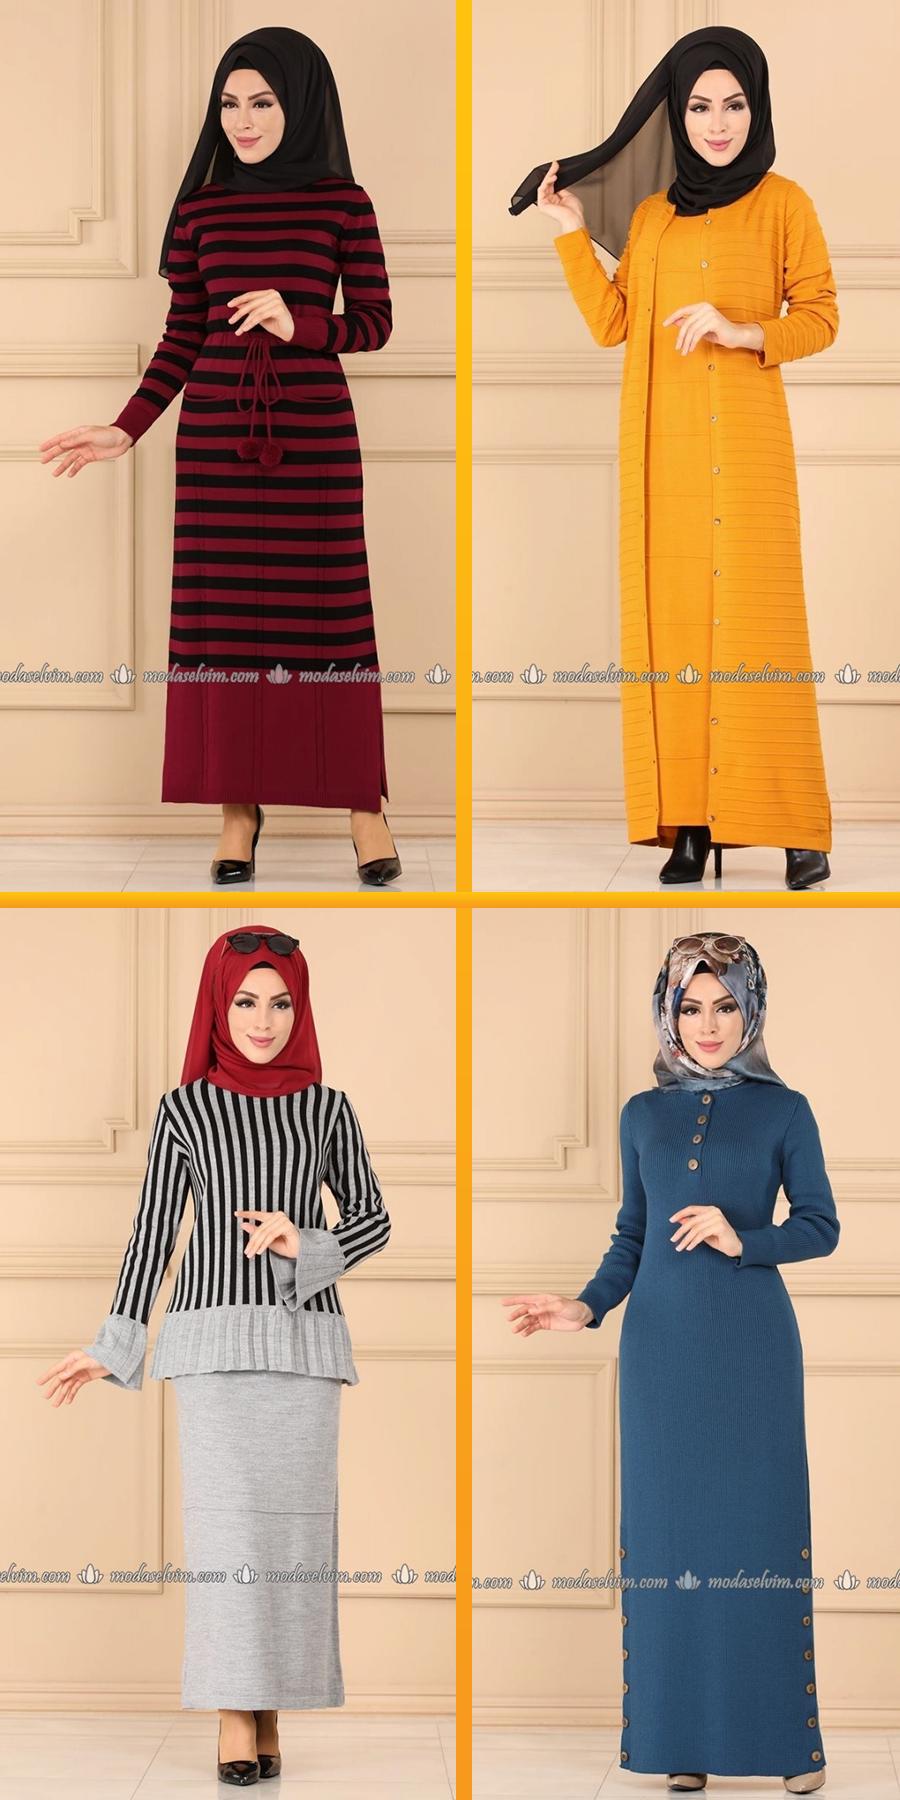 Modaselvim 2020 Triko Tesettur Elbise Modelleri Tesettur Triko Modelleri 2020 Clothes High Neck Dress Fashion